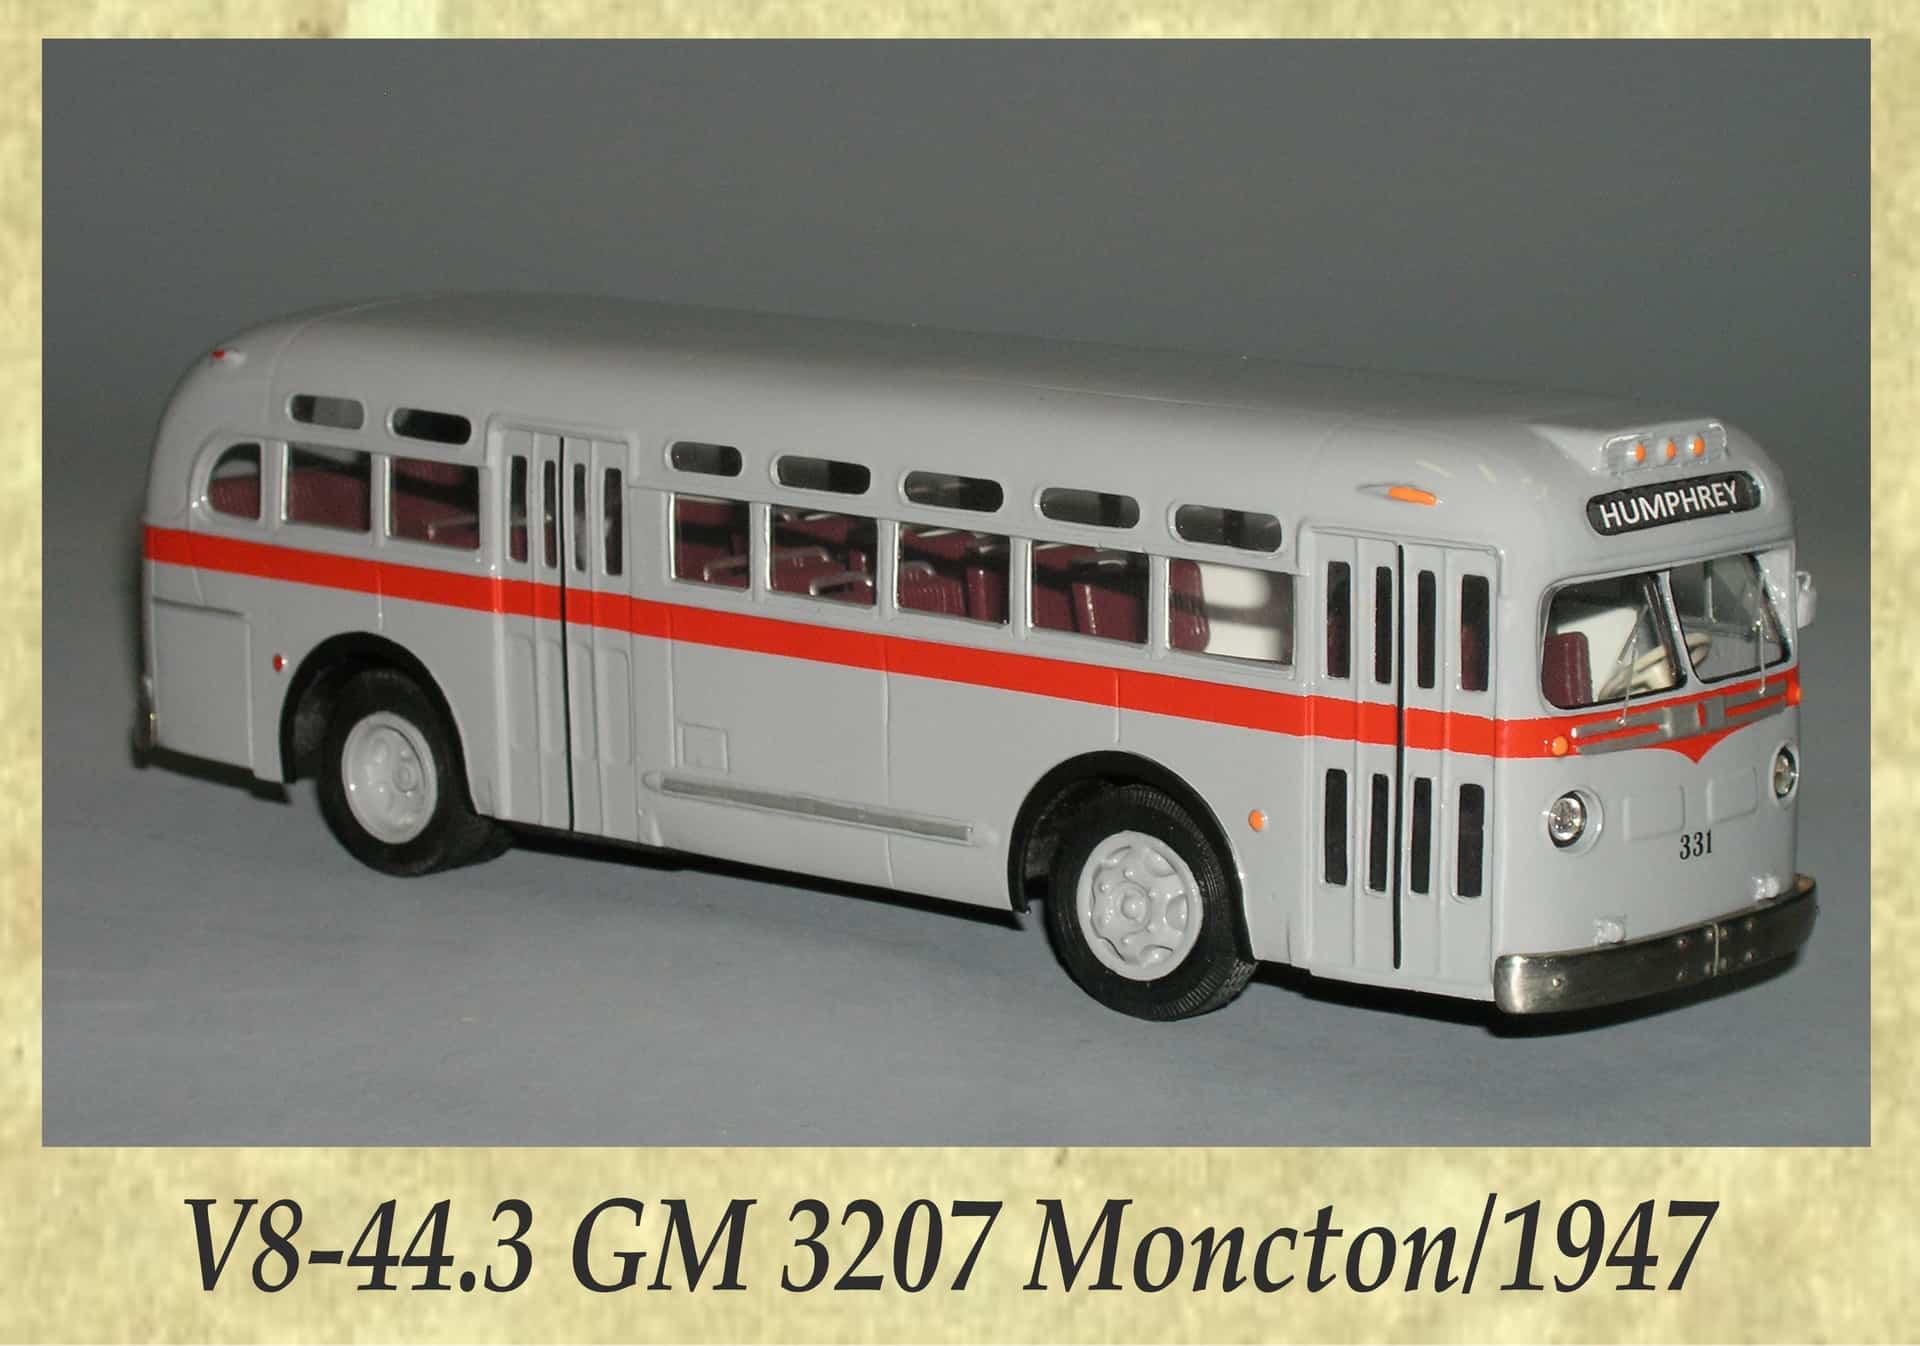 V8-44.3 GM 3207 Moncton 1947